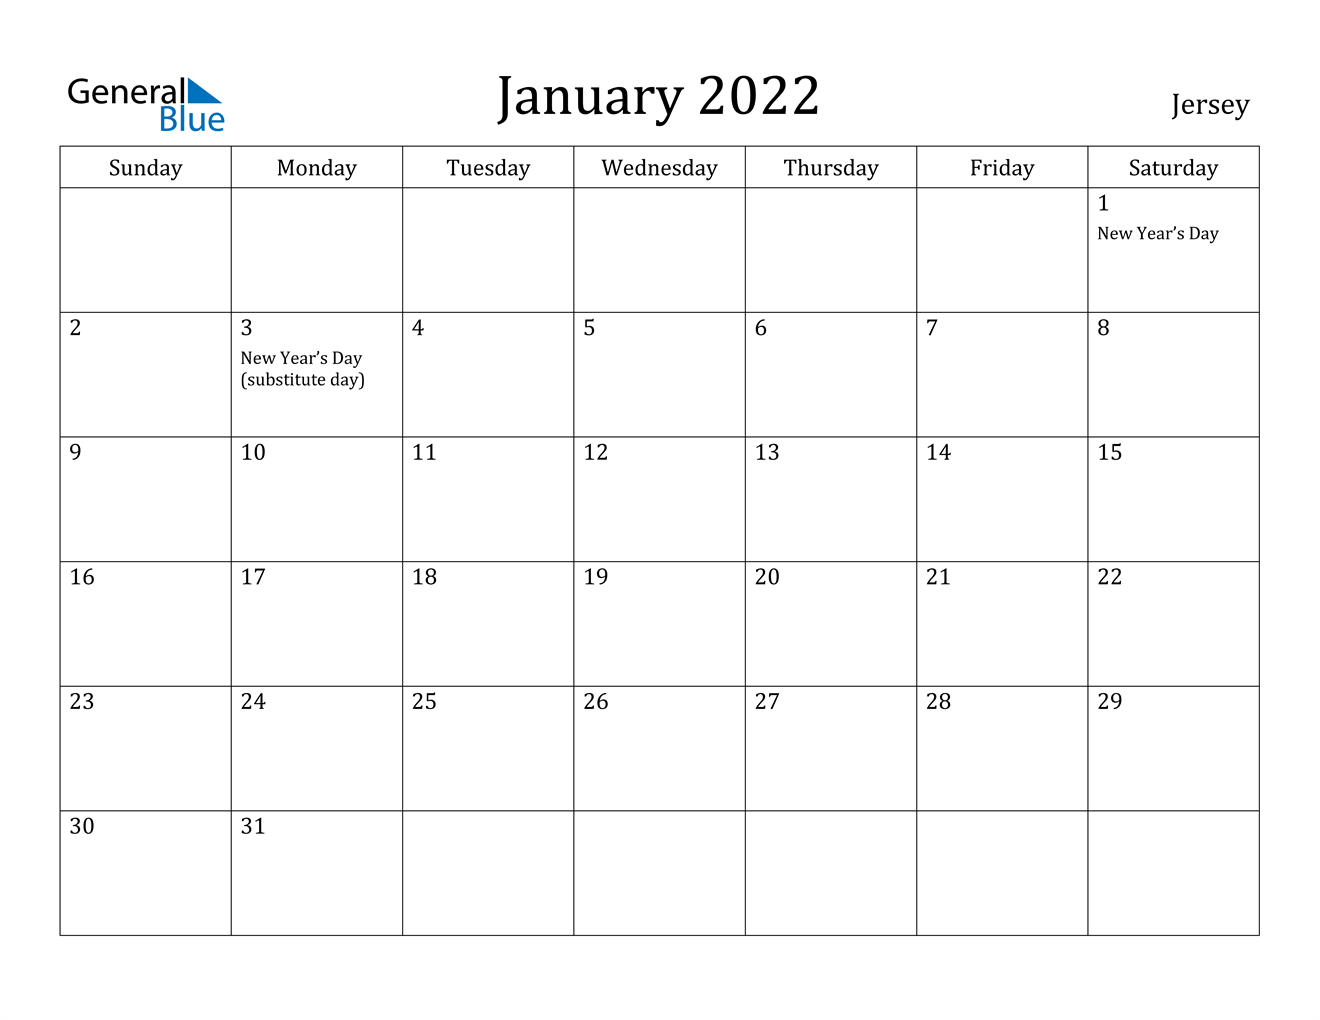 January 2022 Calendar – Jersey Intended For Monthly Calendar 2022 January